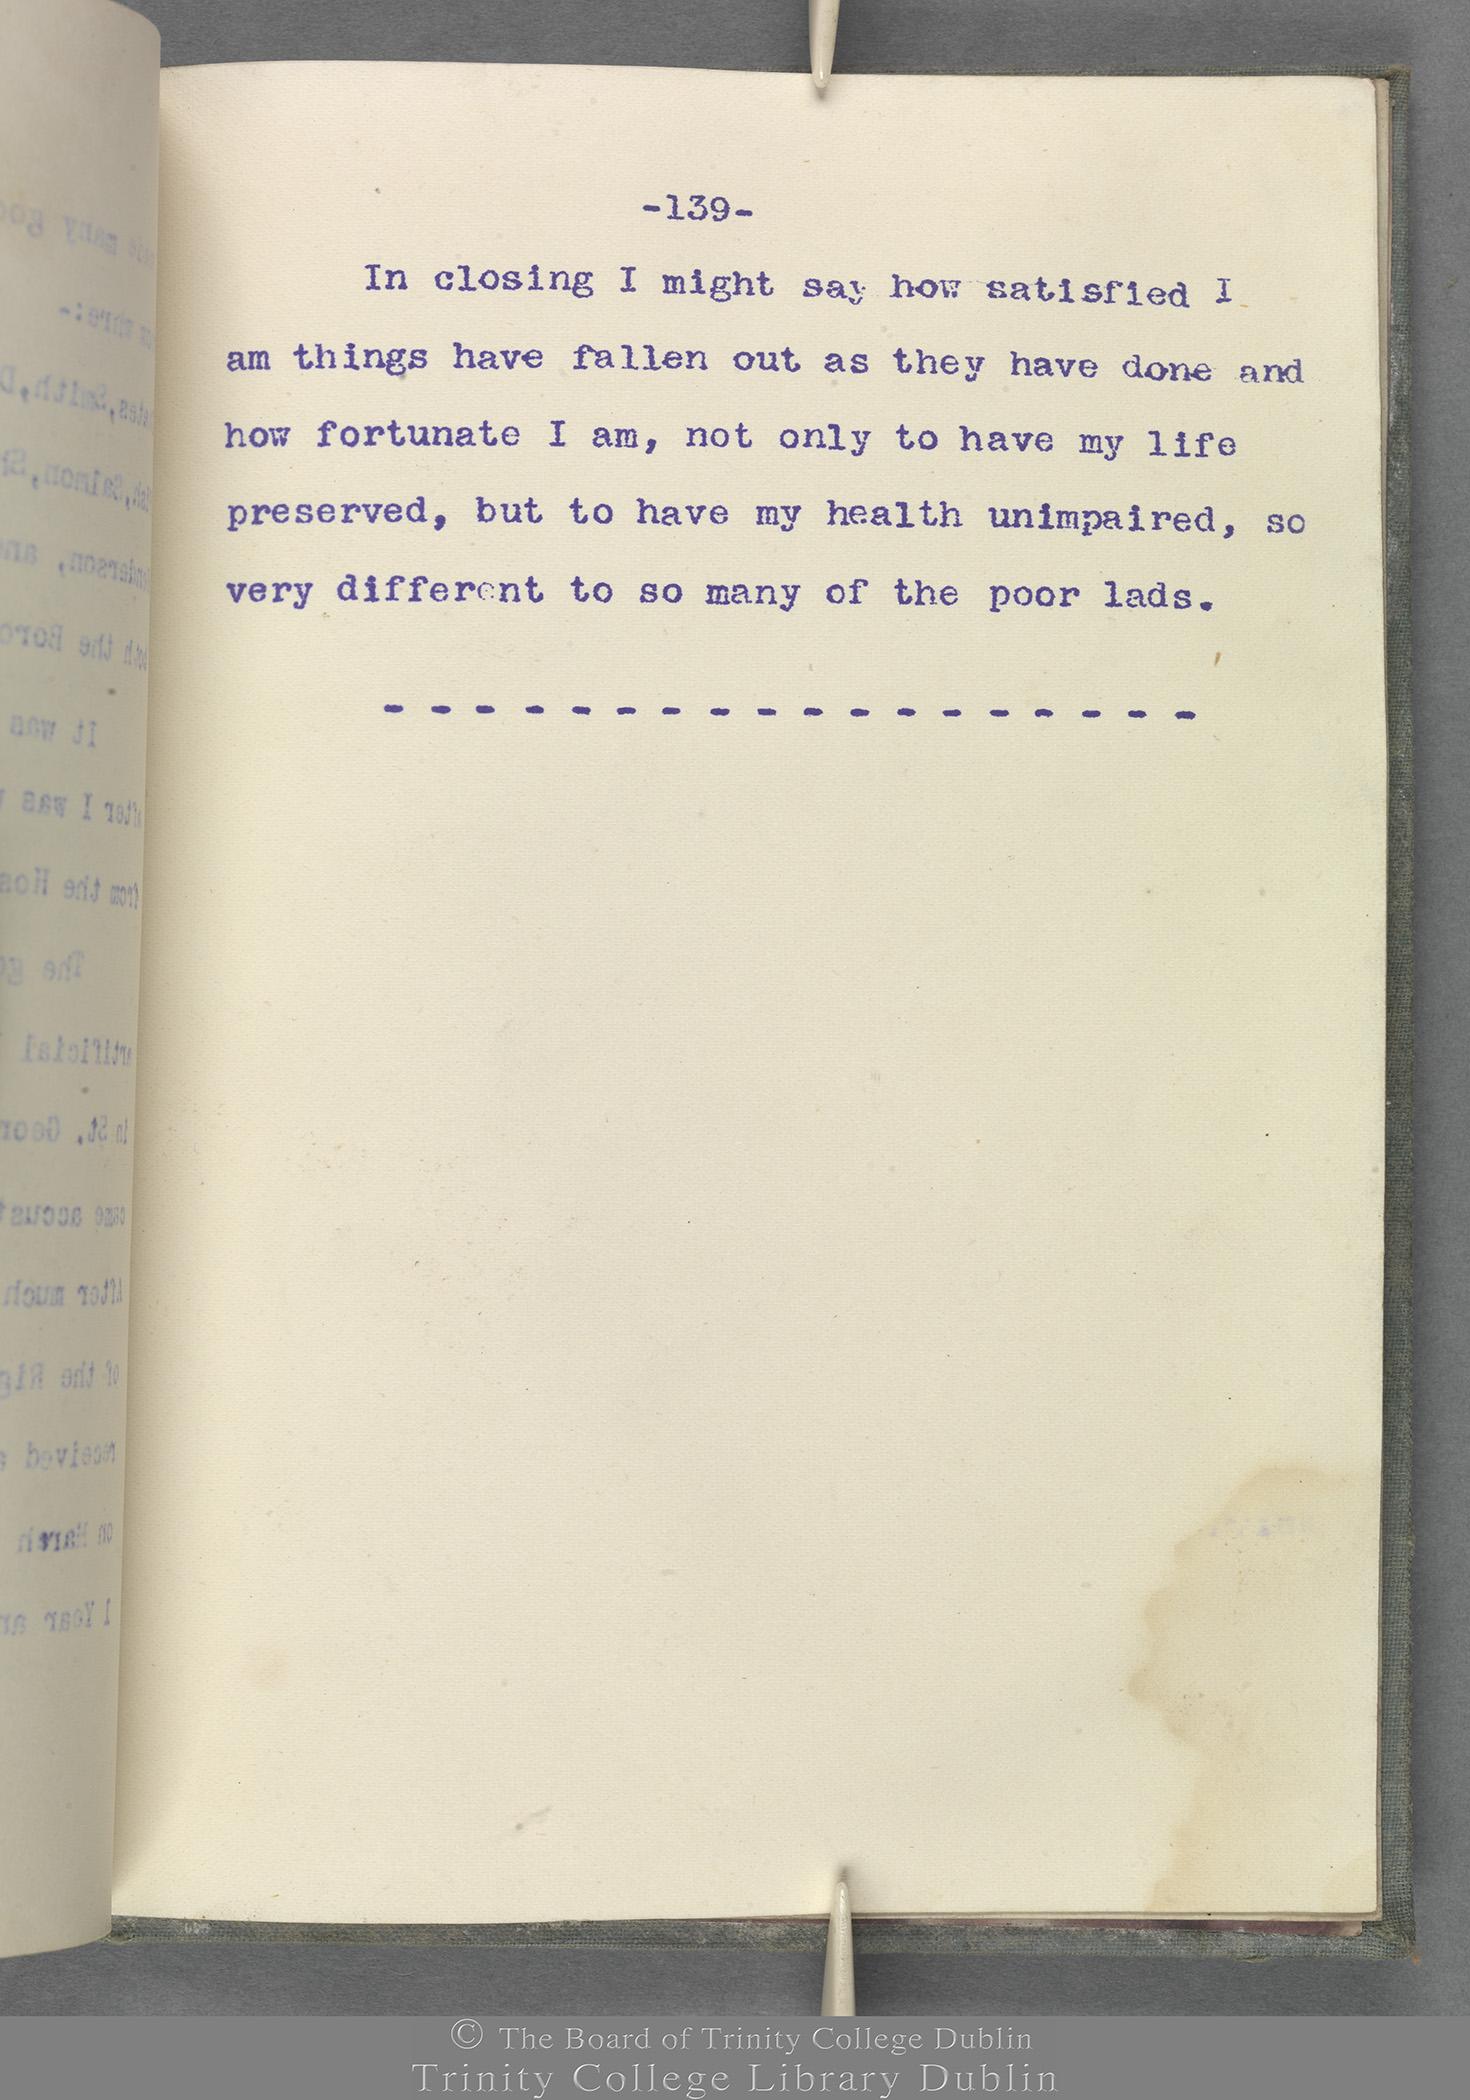 TCD MS 10853 folio 139 recto